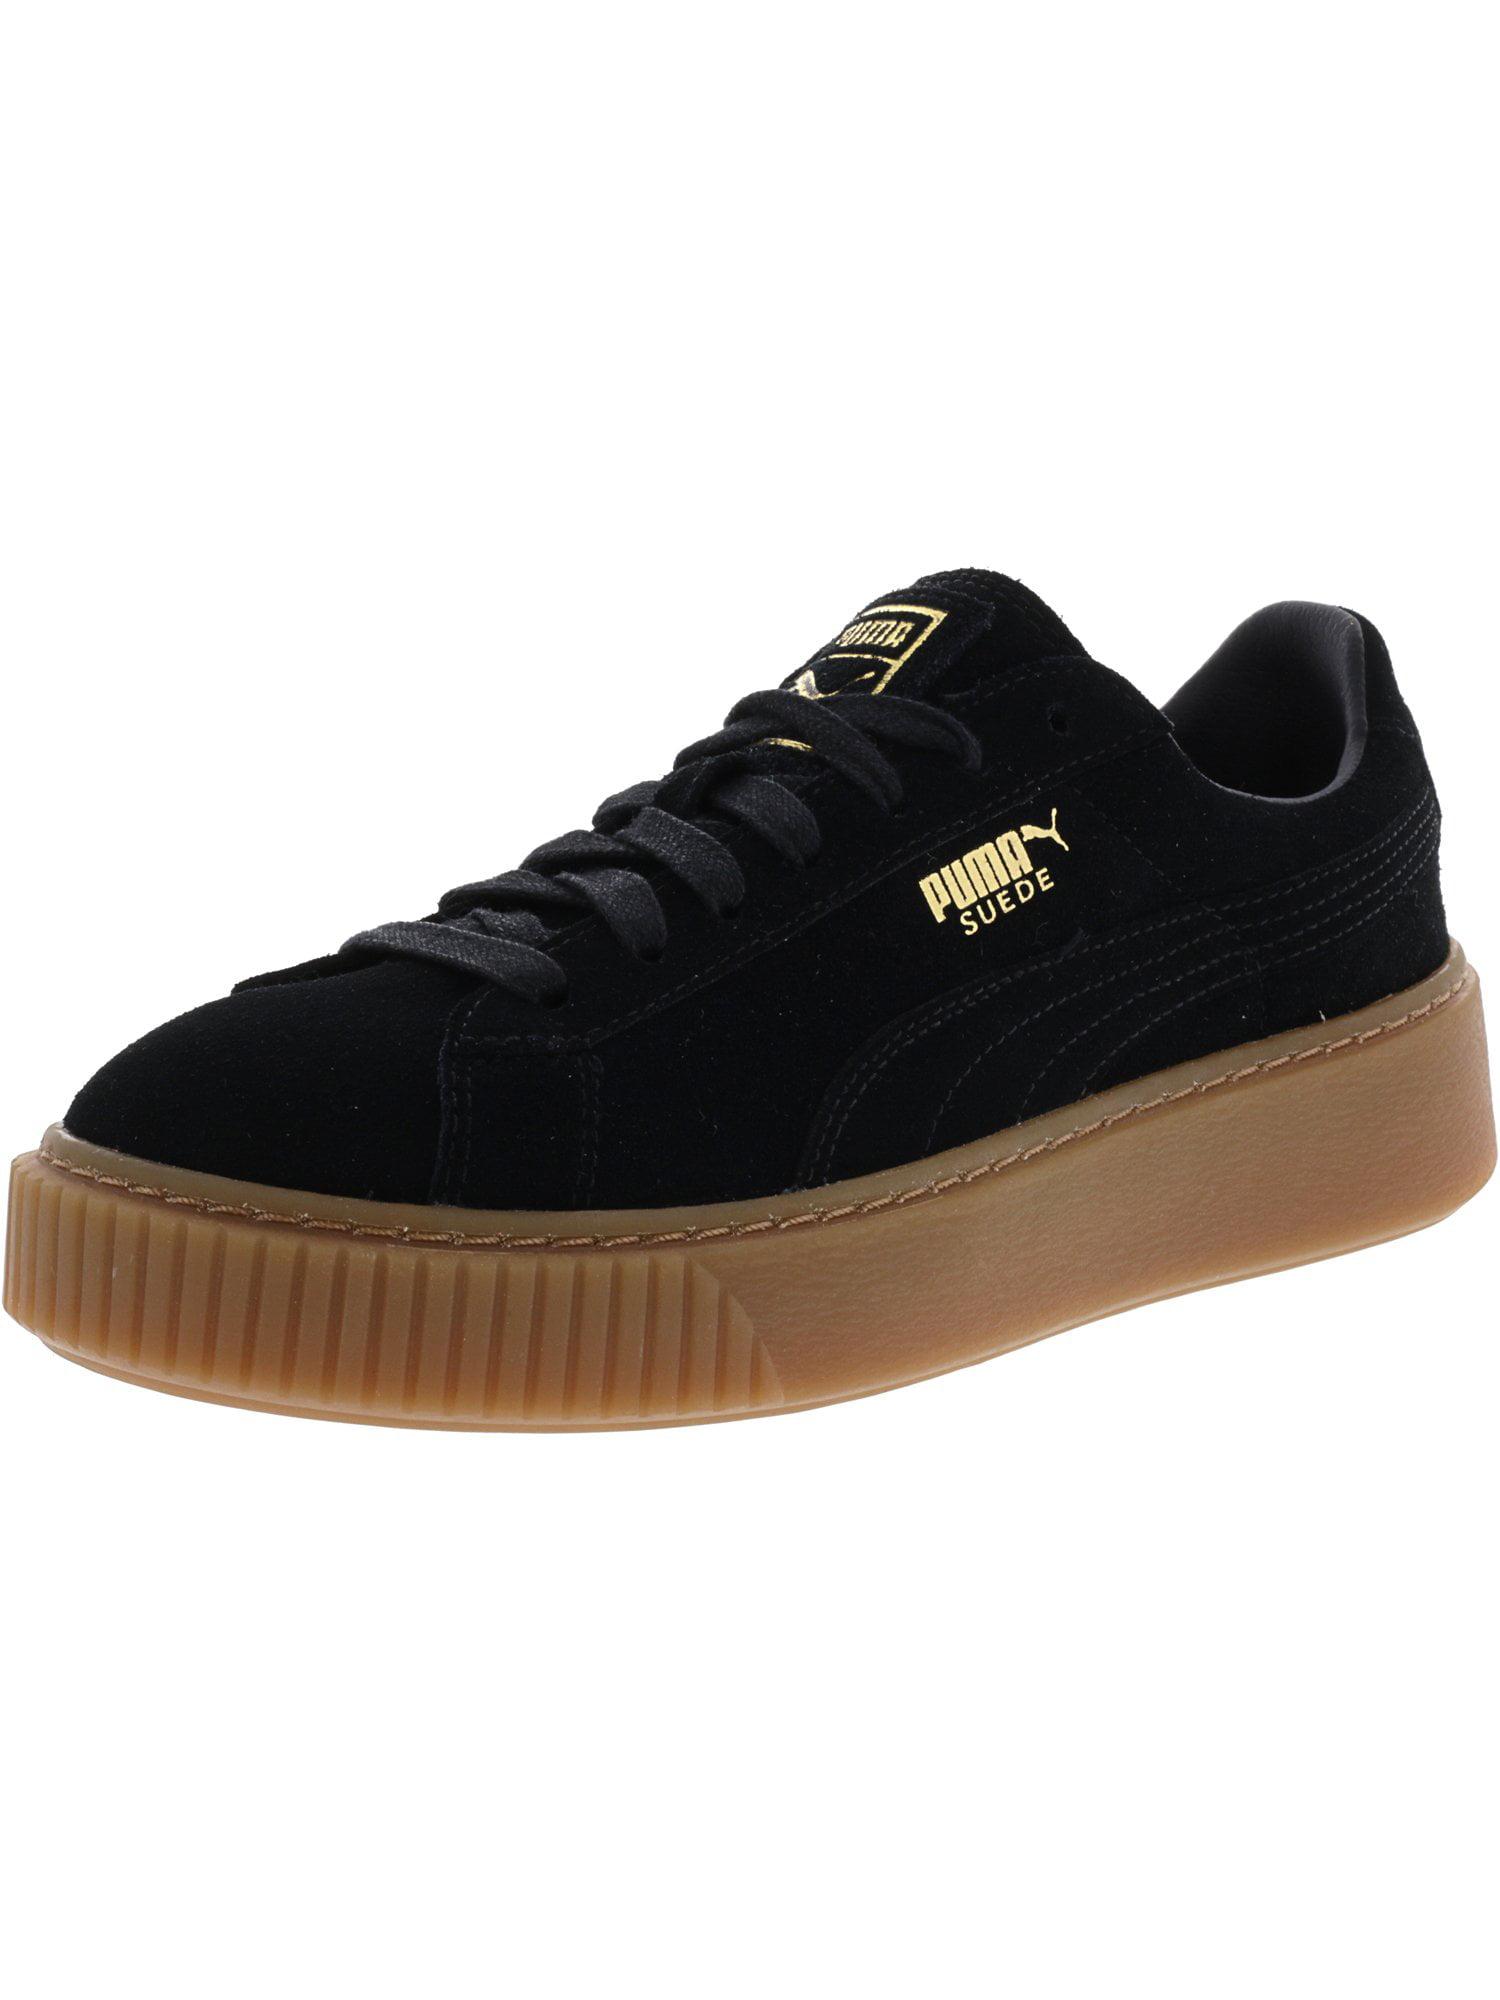 Puma Women's Suede Platform Sd Black / Gold Fashion Sneaker - 8M